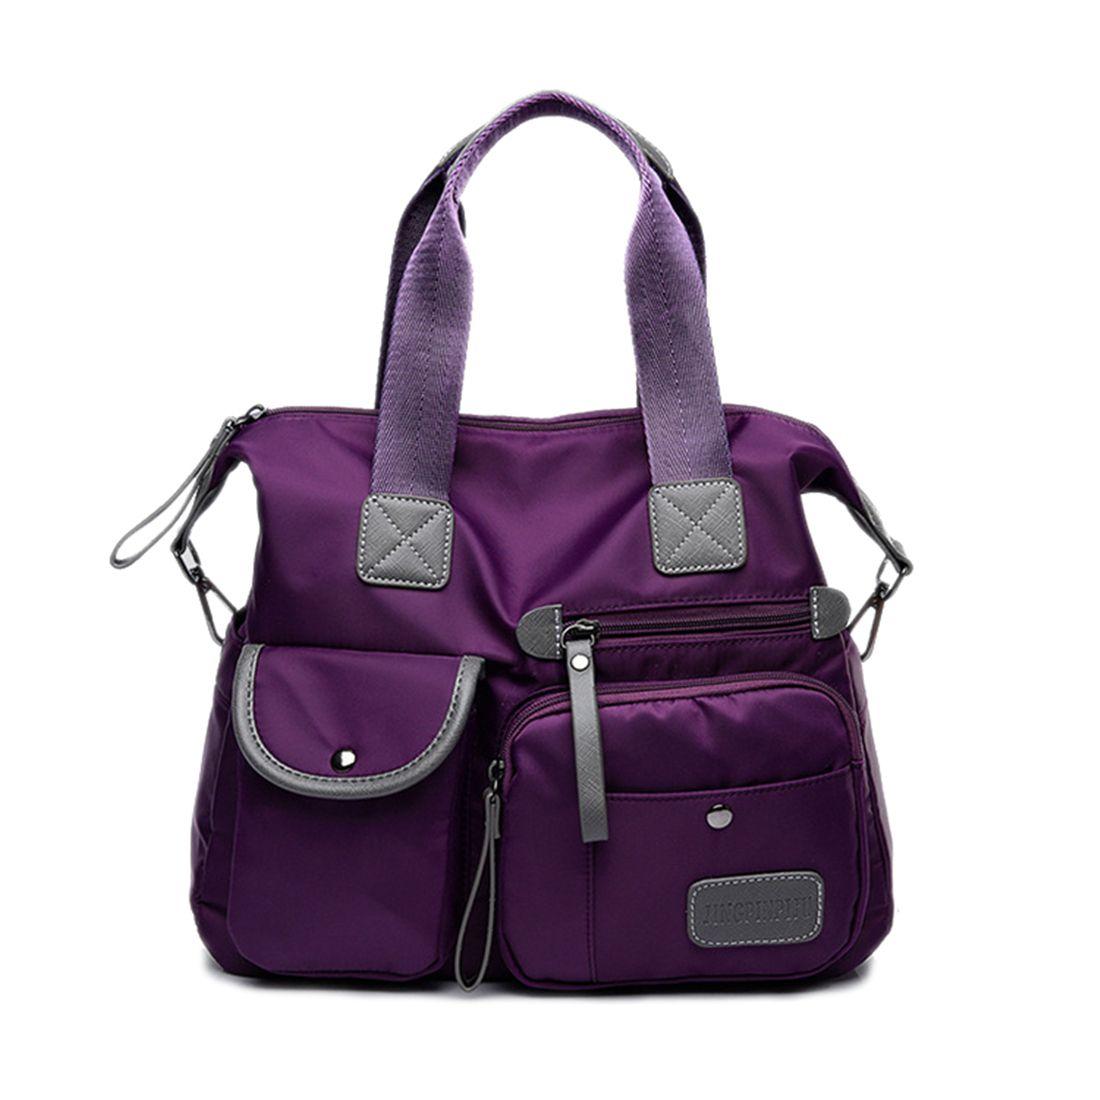 purple New Ladies Fashion Waterproof Oxford Tote Bag Casual Nylon Shoulder Bag Mummy Bag Large Capacity Canvas Bagpurple New Ladies Fashion Waterproof Oxford Tote Bag Casual Nylon Shoulder Bag Mummy Bag Large Capacity Canvas Bag